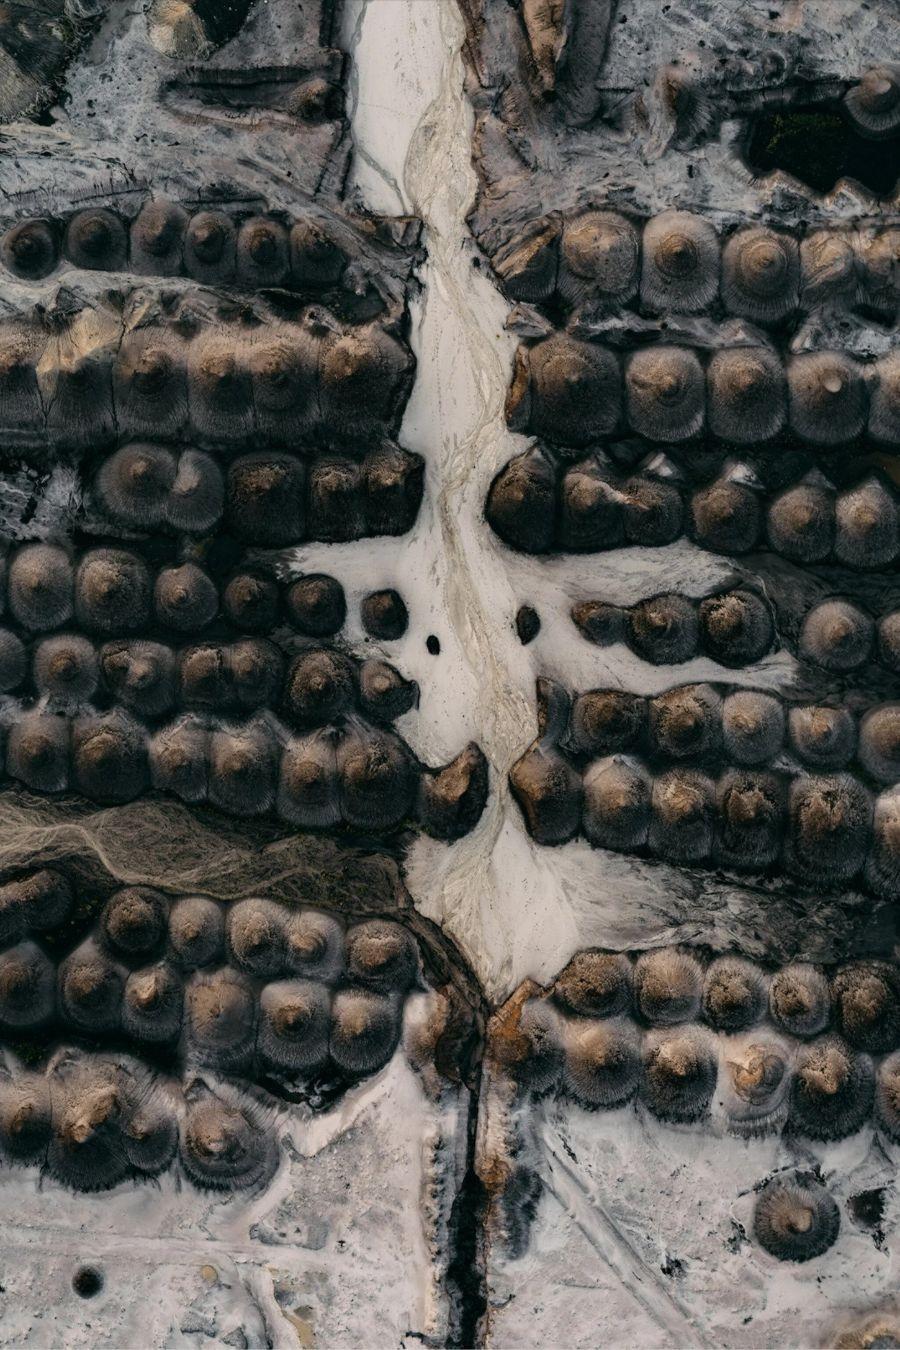 The Coal Mine Series by Tom Hegen